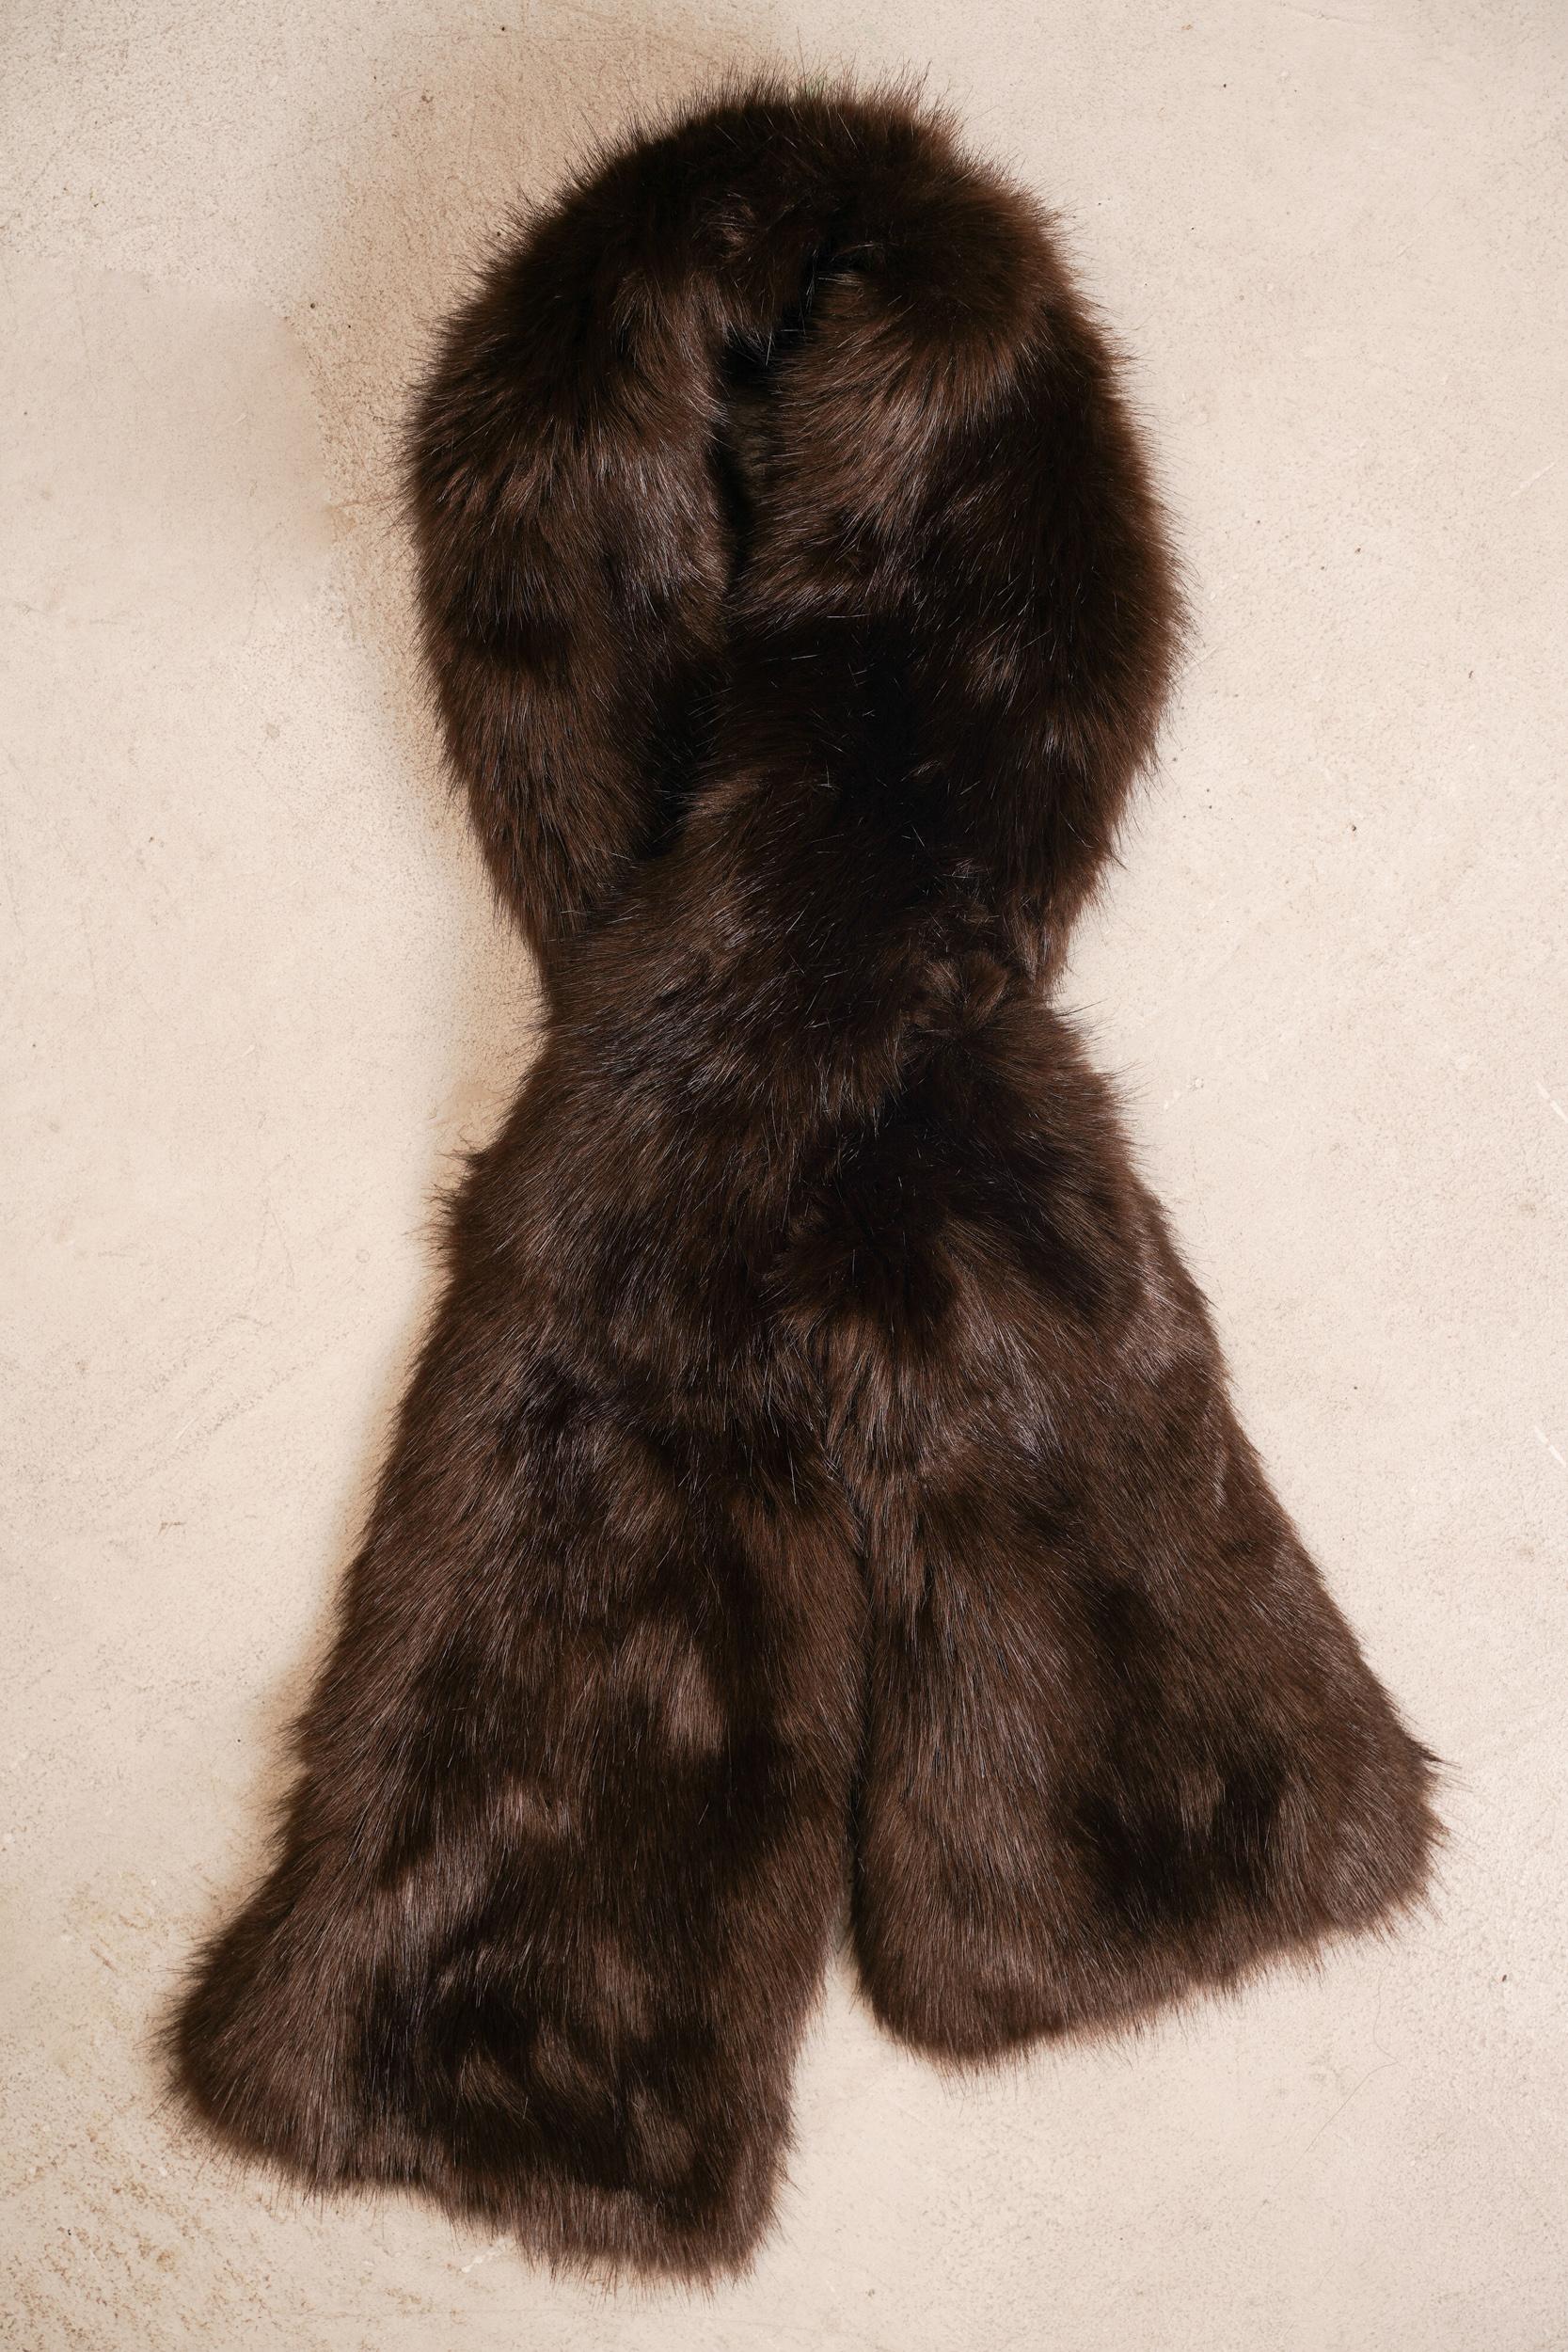 helen moore(ヘレンムーア)の毛足の長いフェイクファーのマフラー